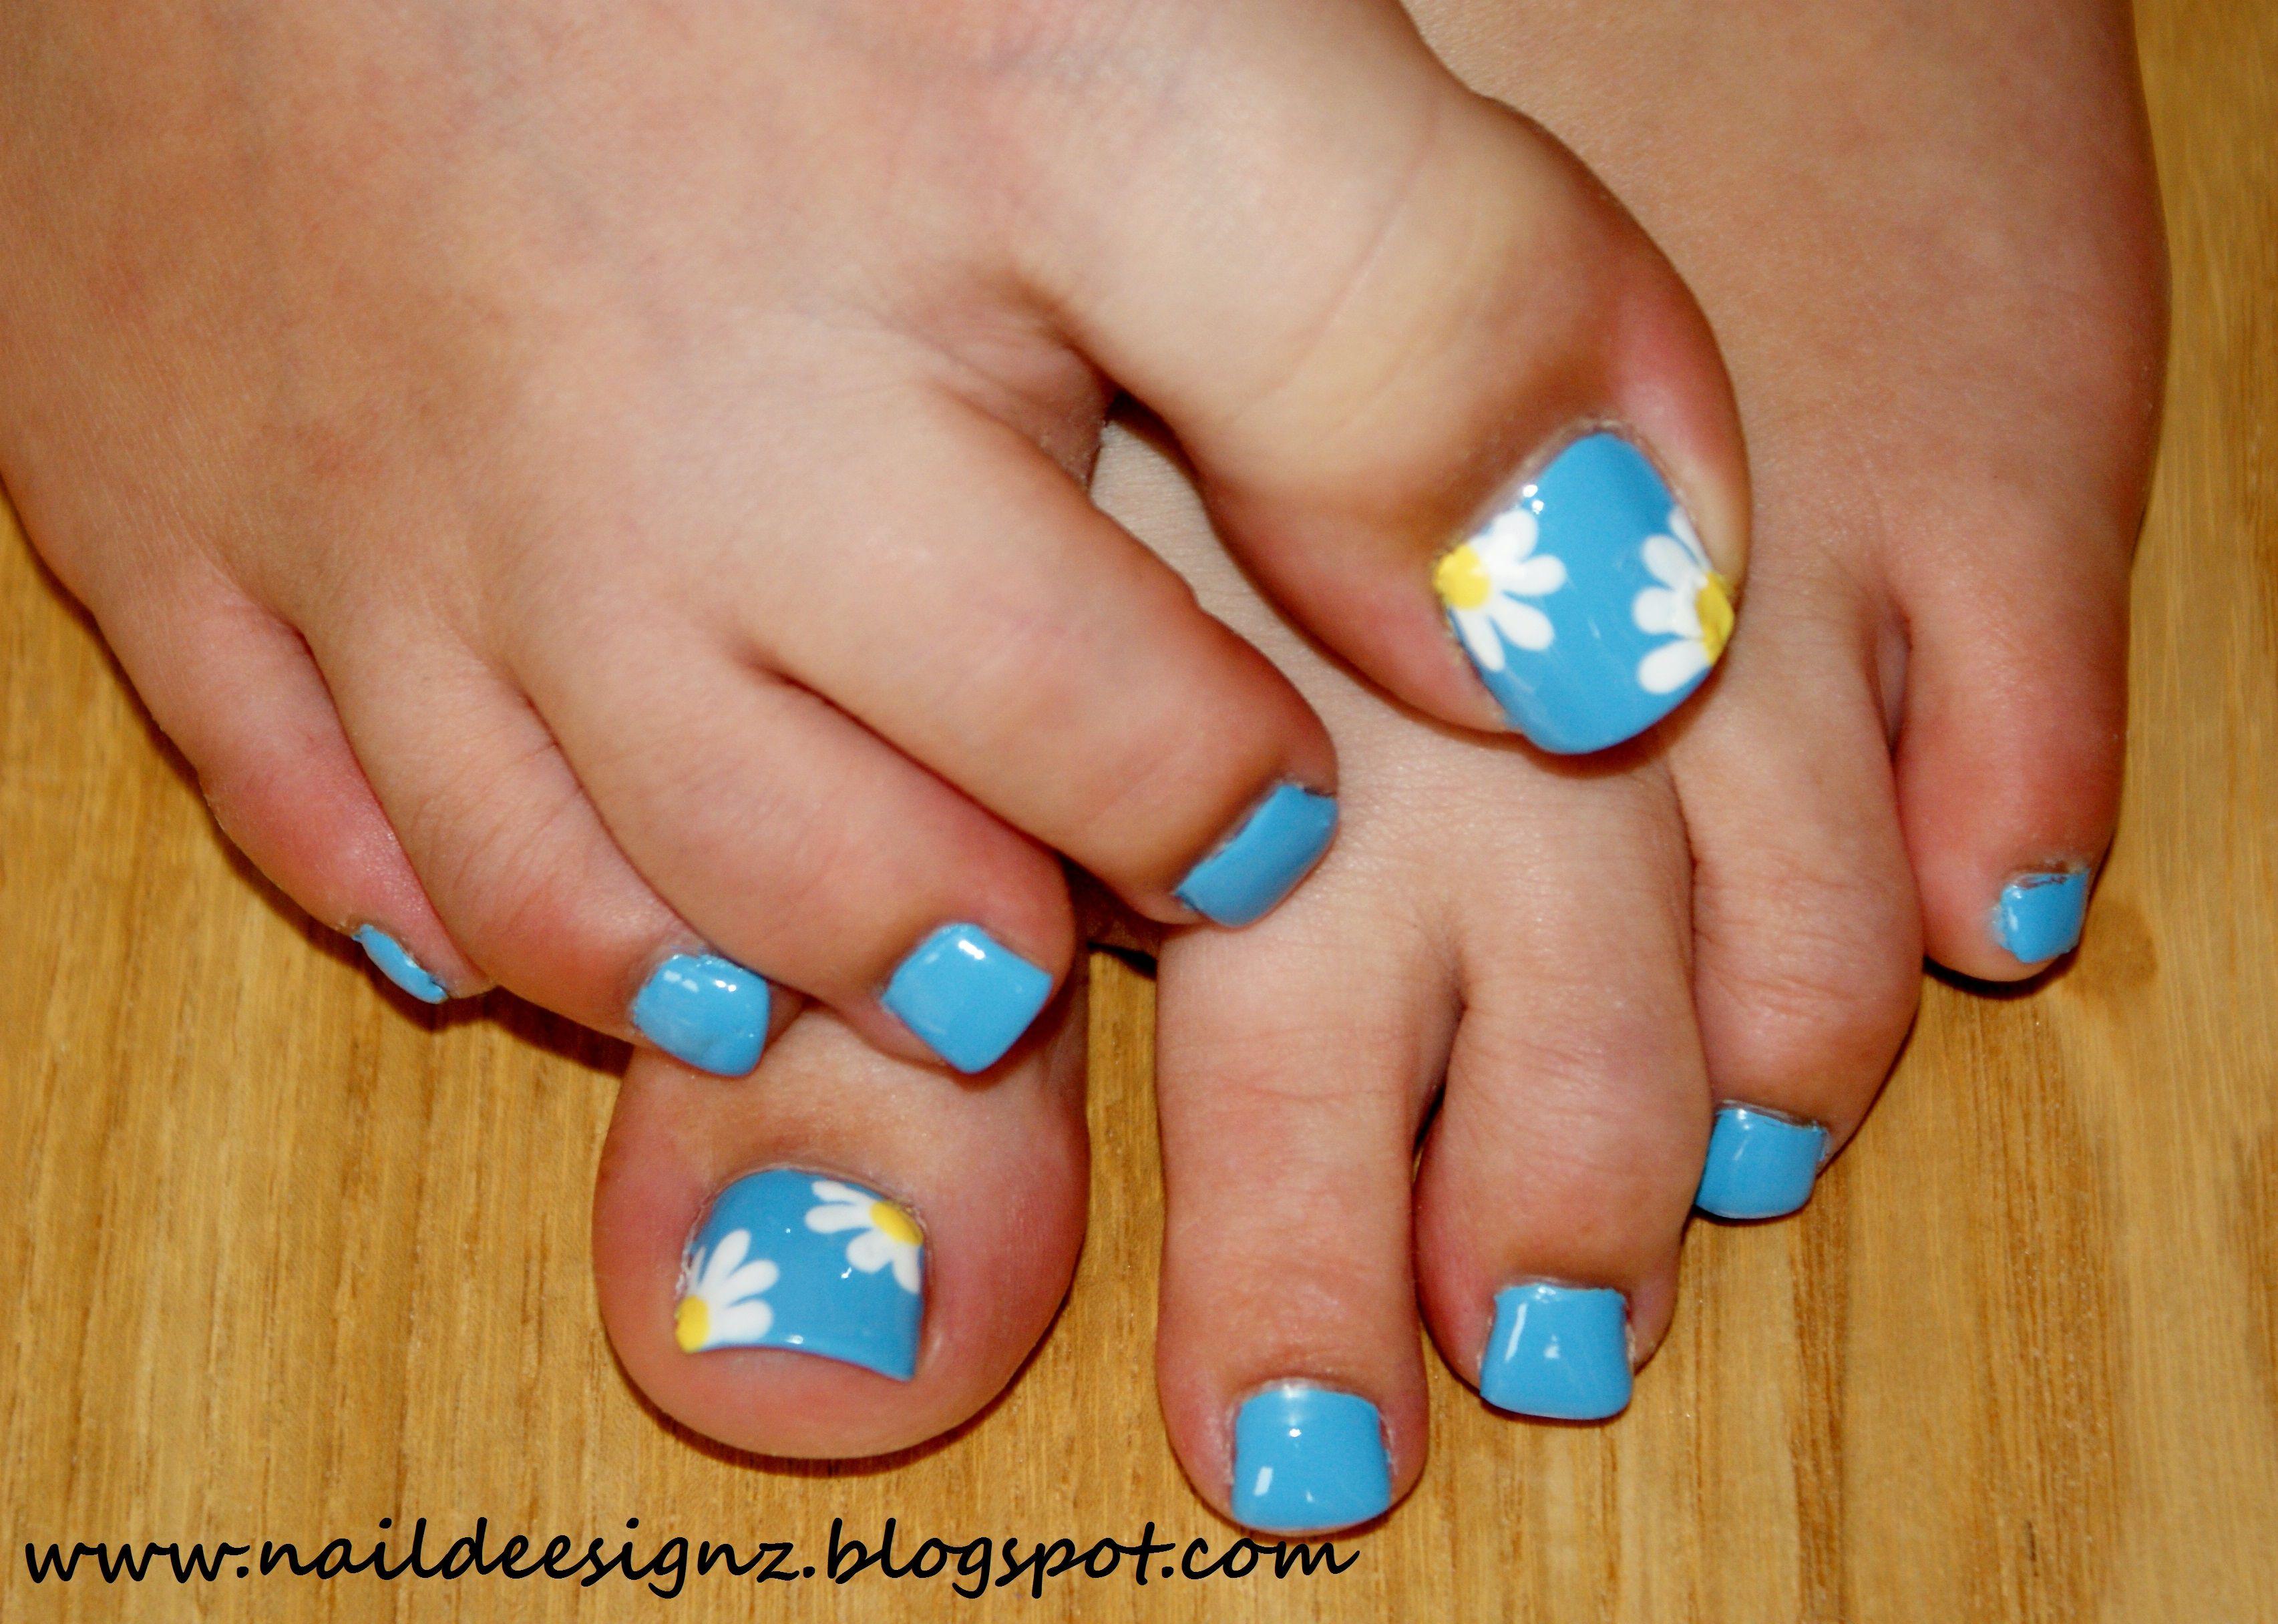 Daisy Nail Art .x. http://www.naildeesignz.blogspot.co.uk/2013/07 ...